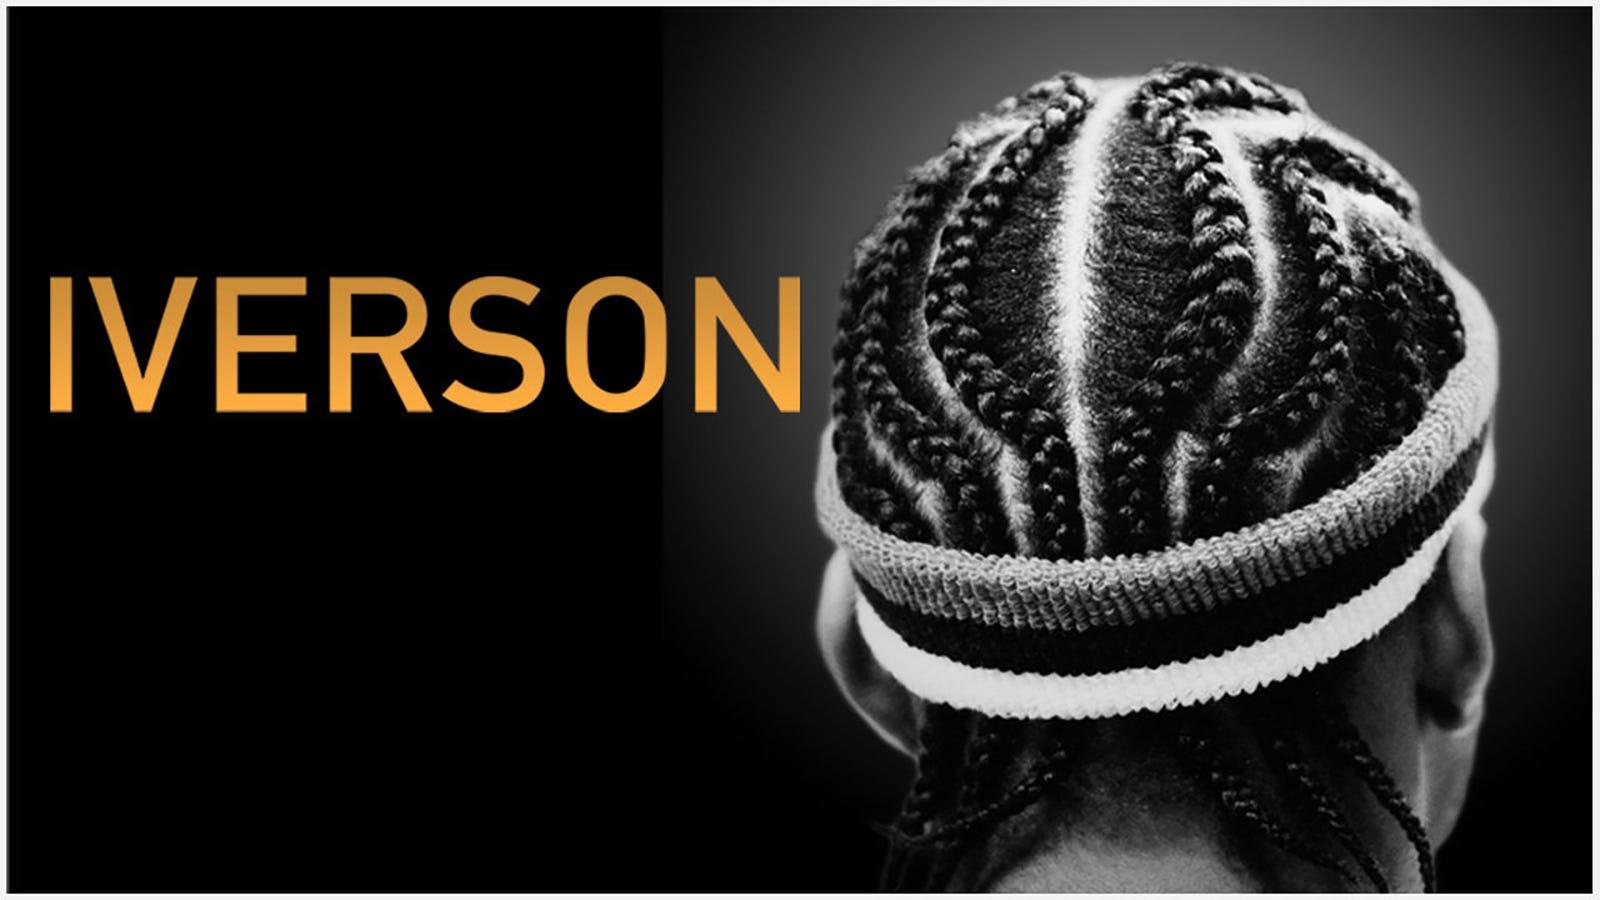 Iverson: Το ντοκιμαντέρ του Netflix για τη ζωή ενός μεγάλου του NBA